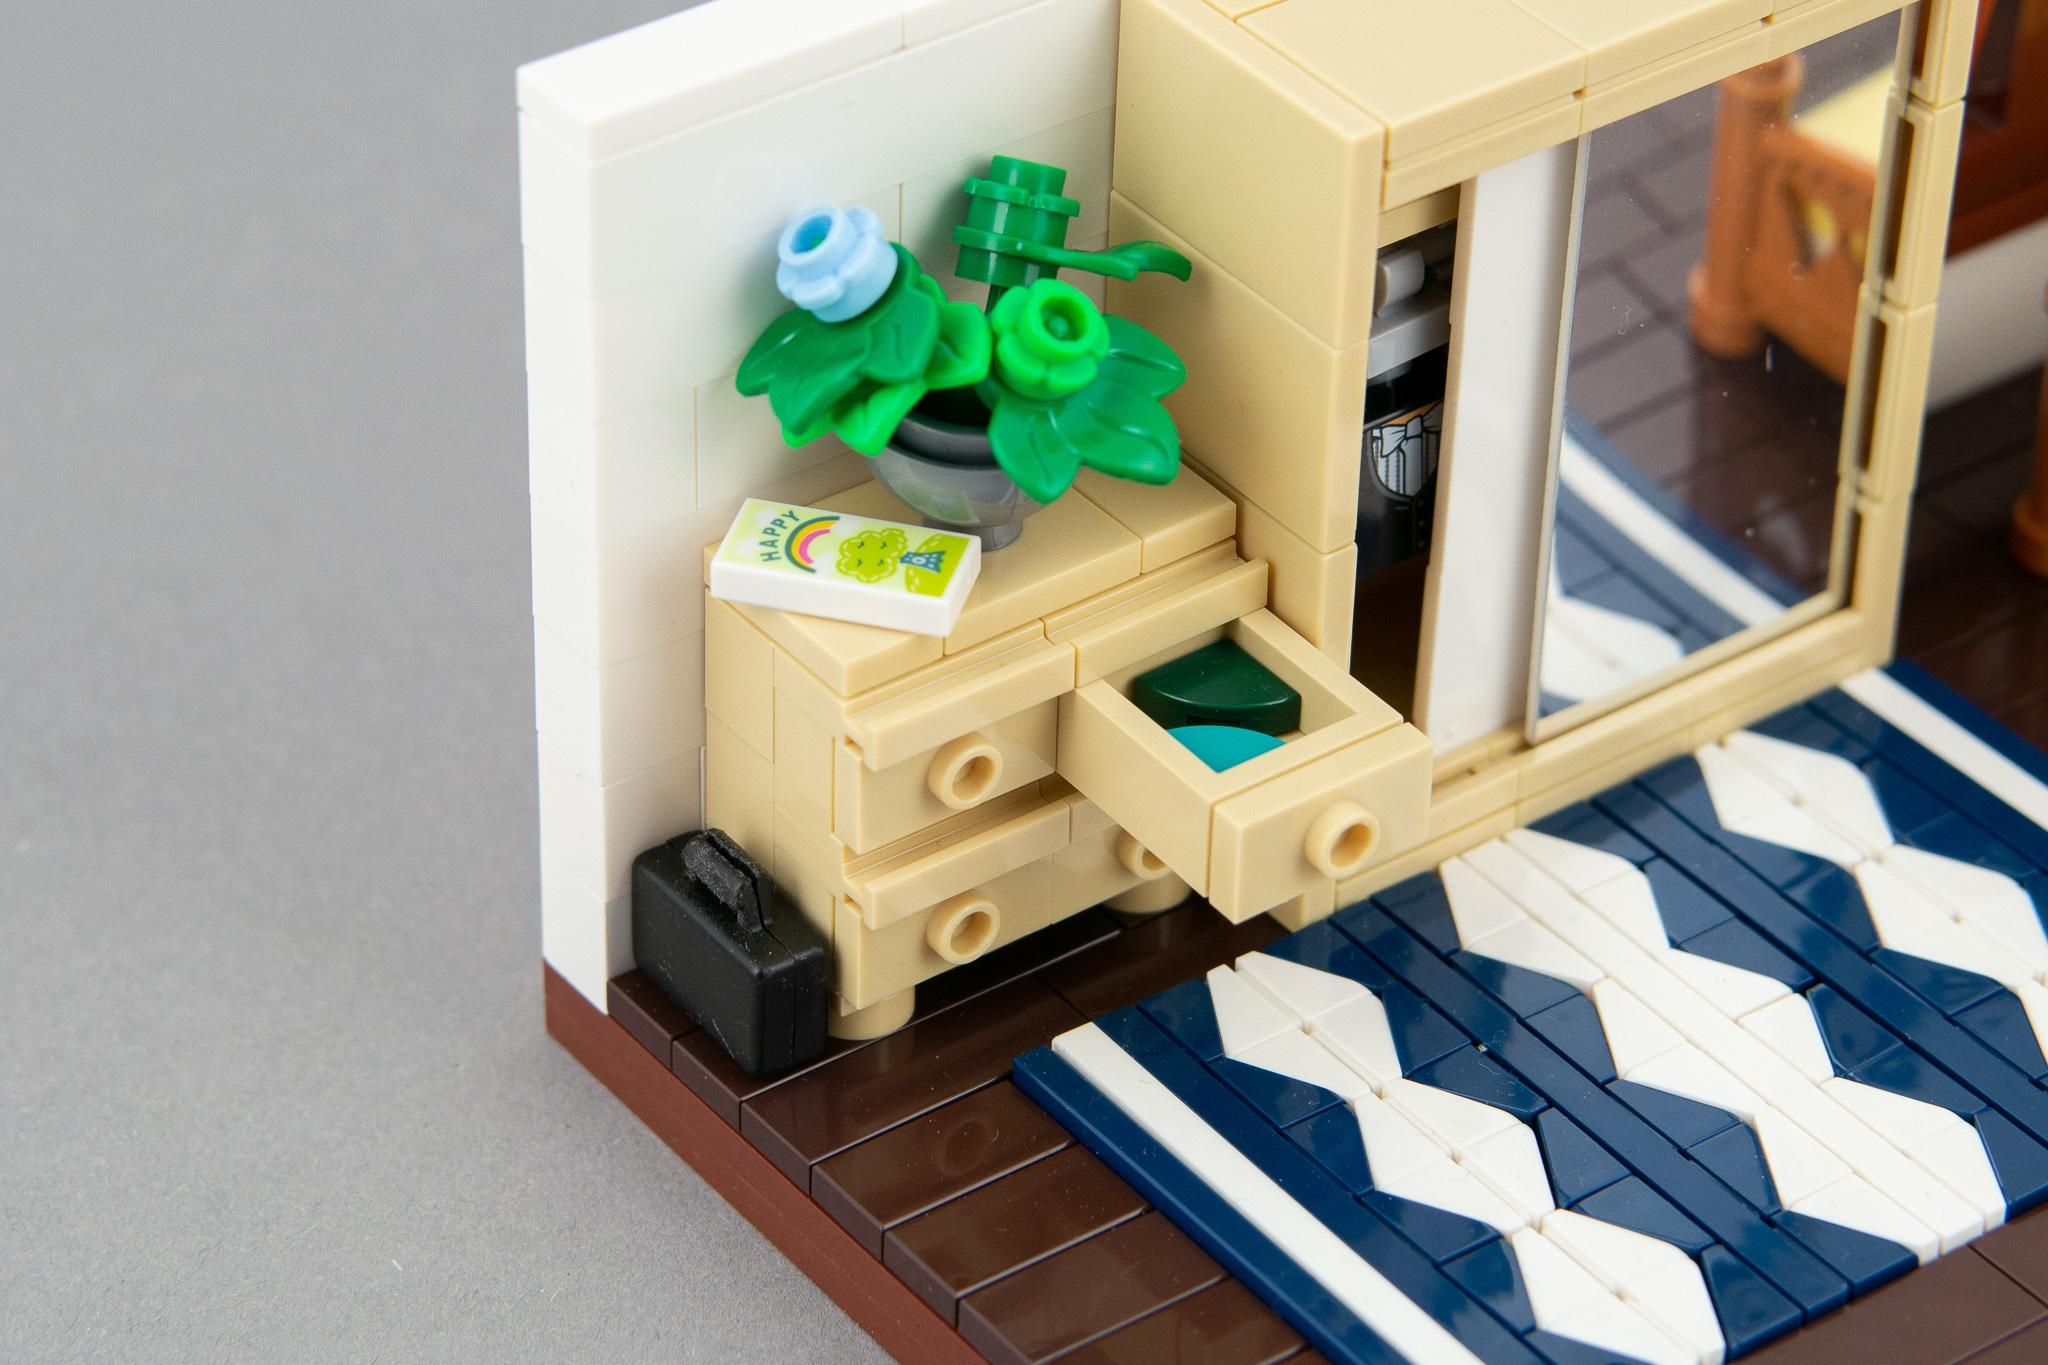 LEGO Schlafzimmer Moc (11)